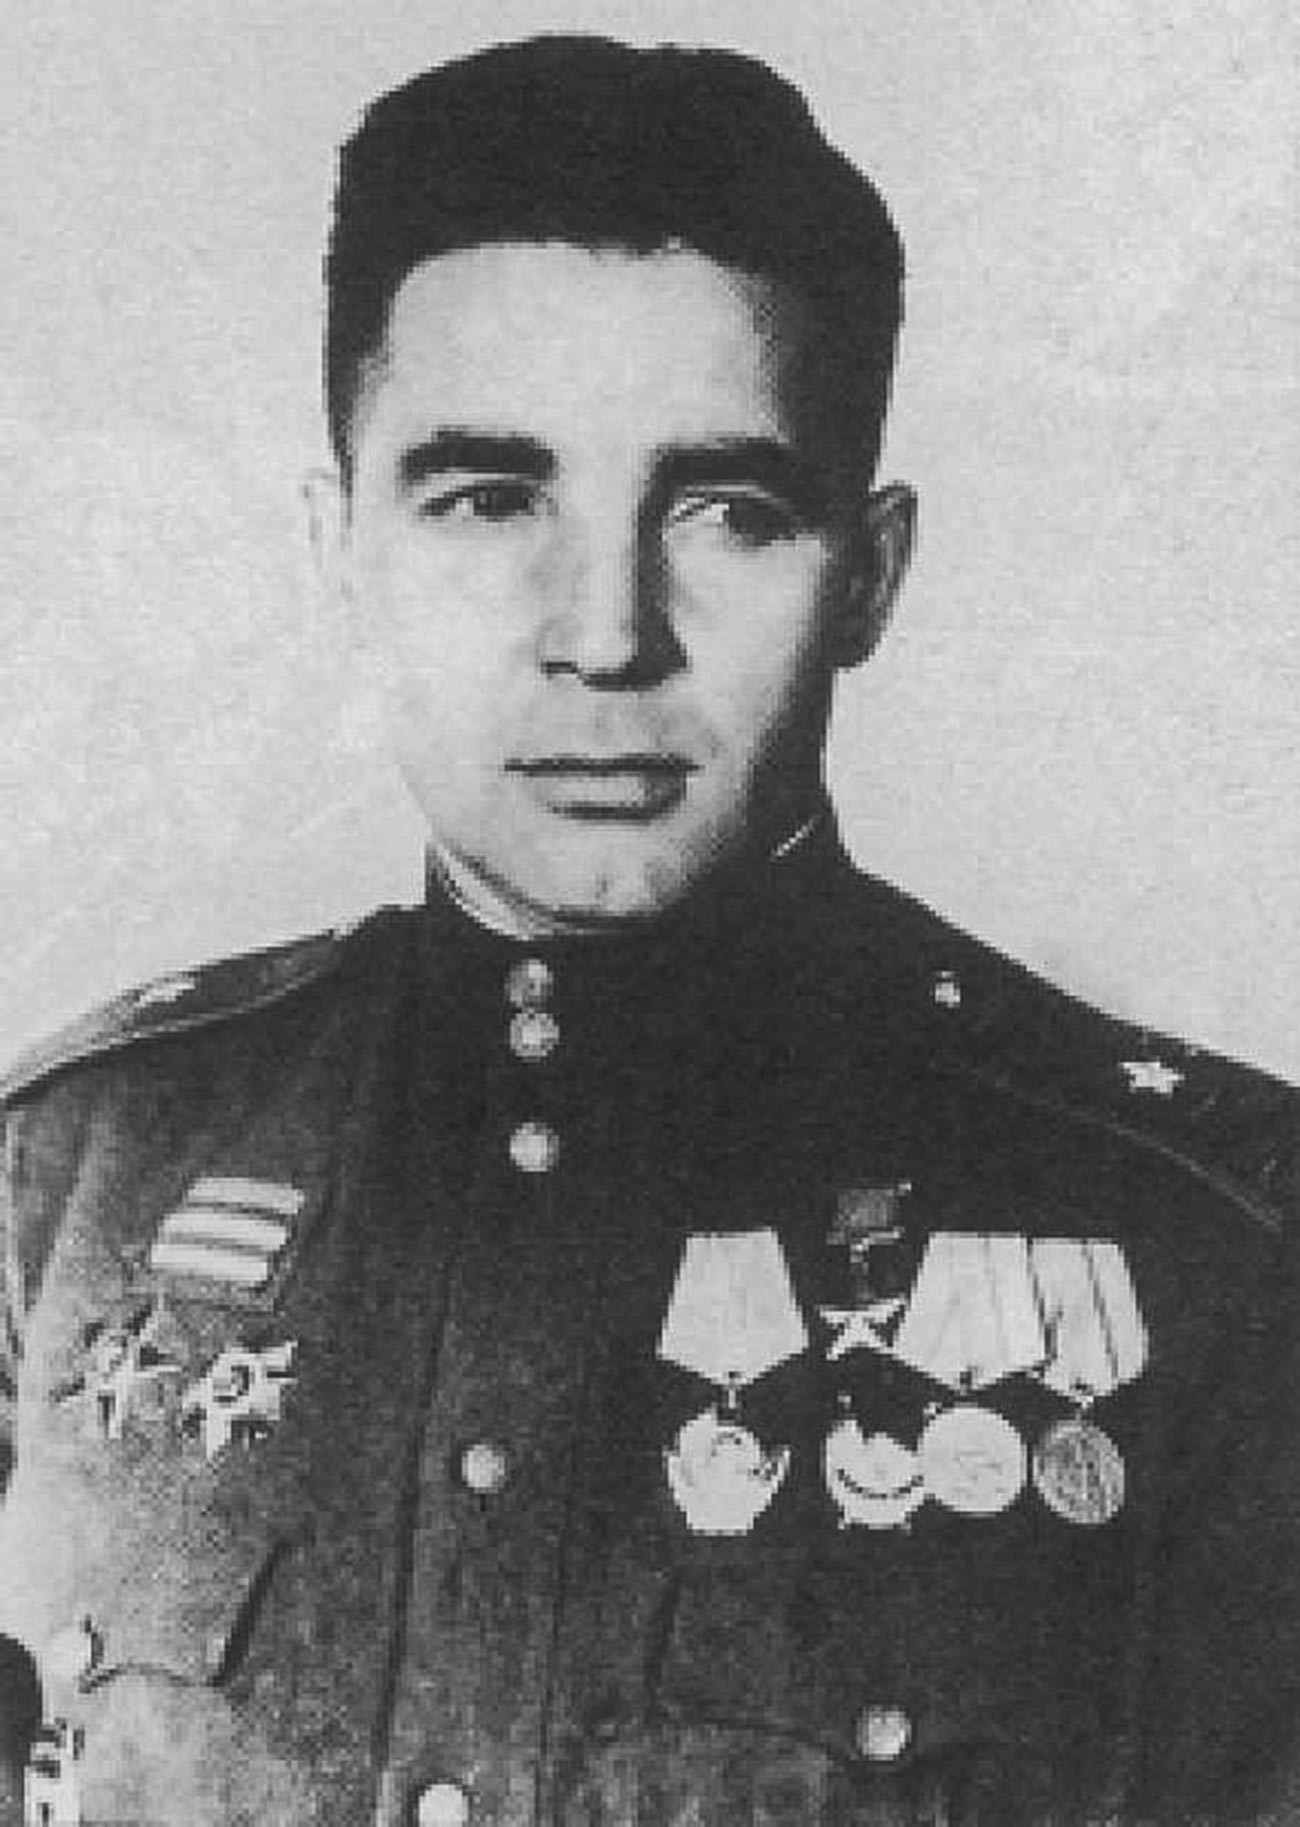 Marguelov durante a 2ª Guerra Mundial